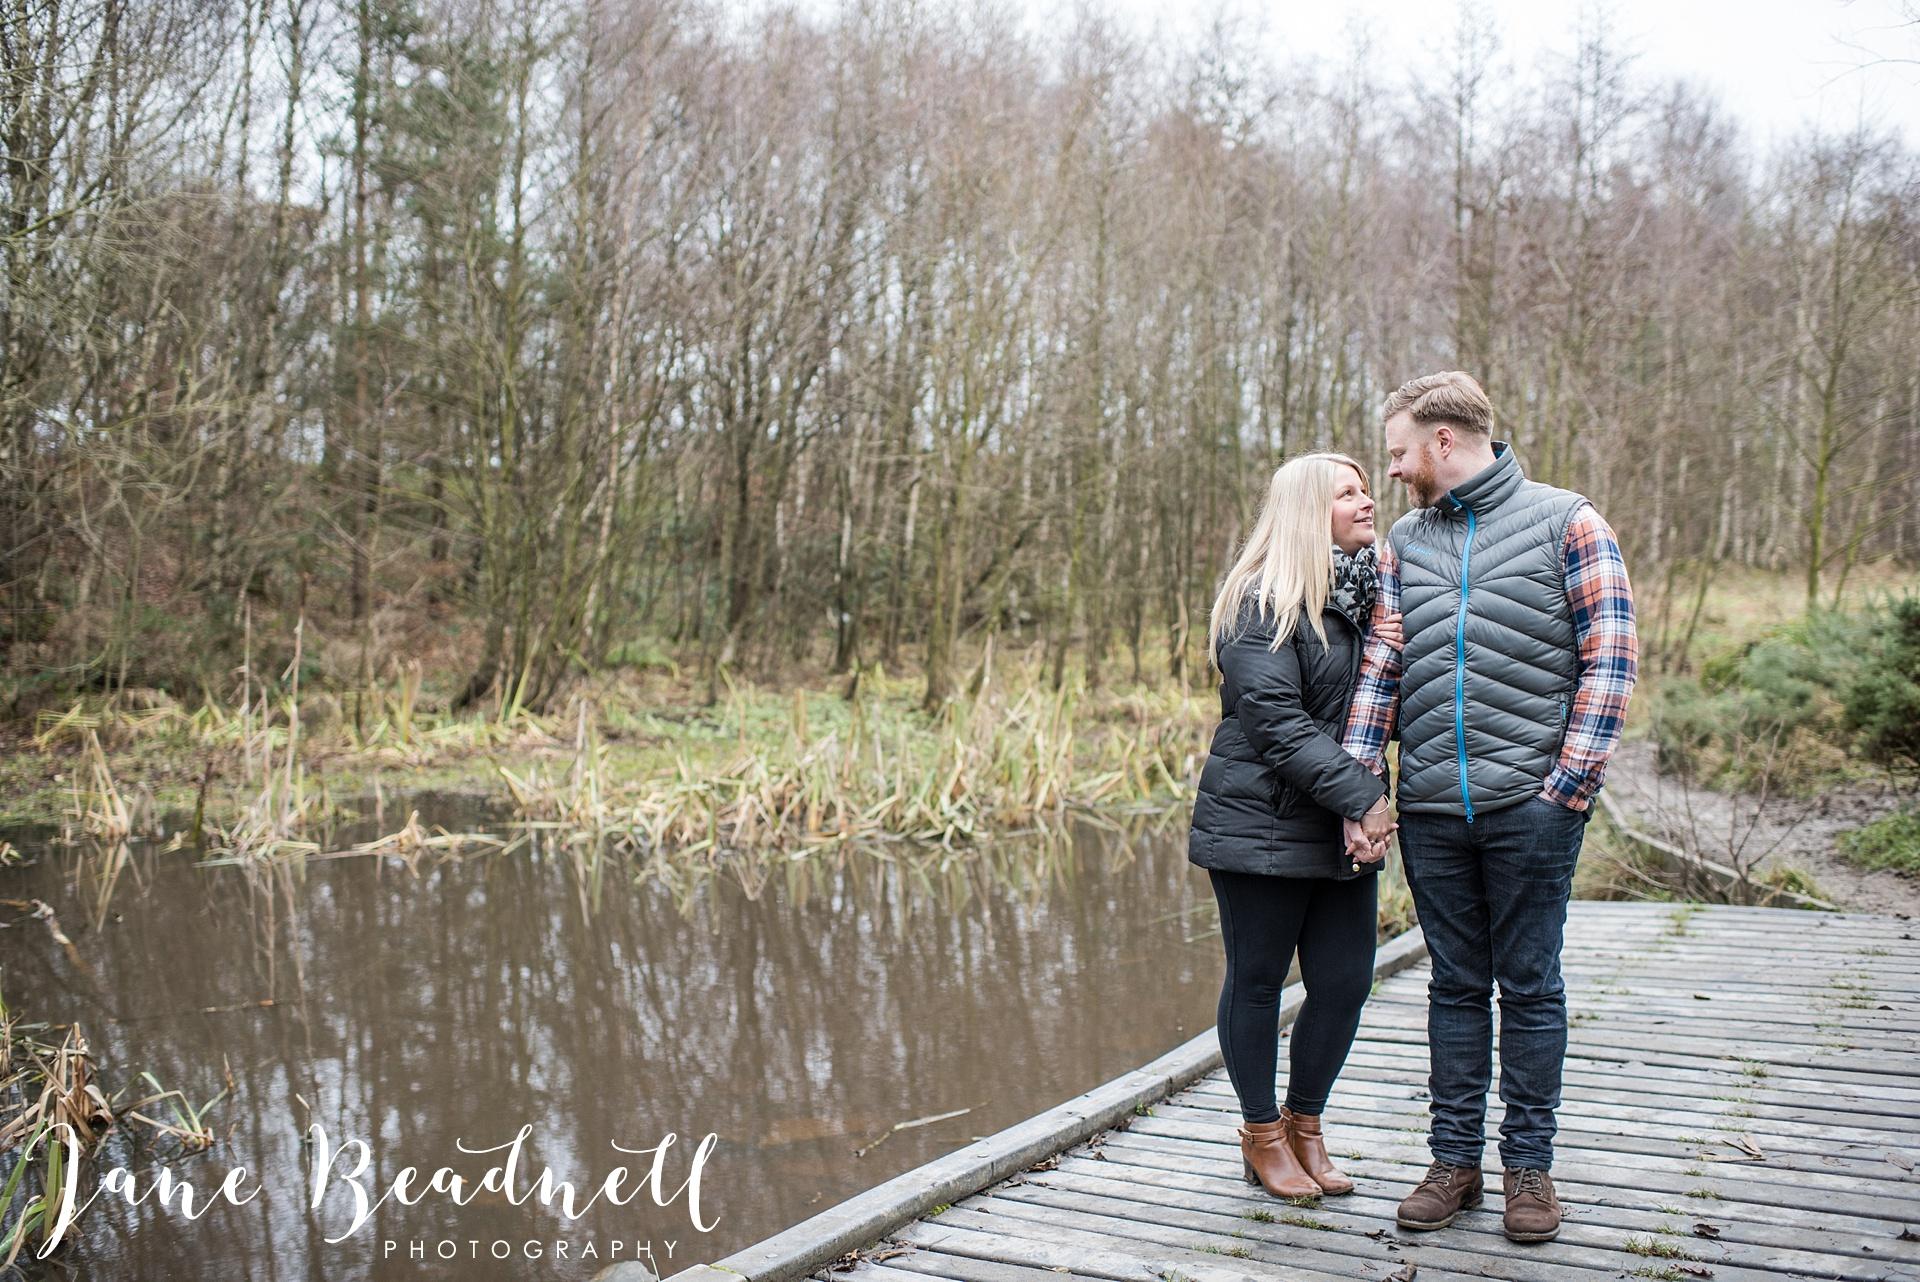 yorkshire-wedding-photographer-jane-beadnell-photography-uk-and-destination-wedding-photographer-engagement-shoot_0023